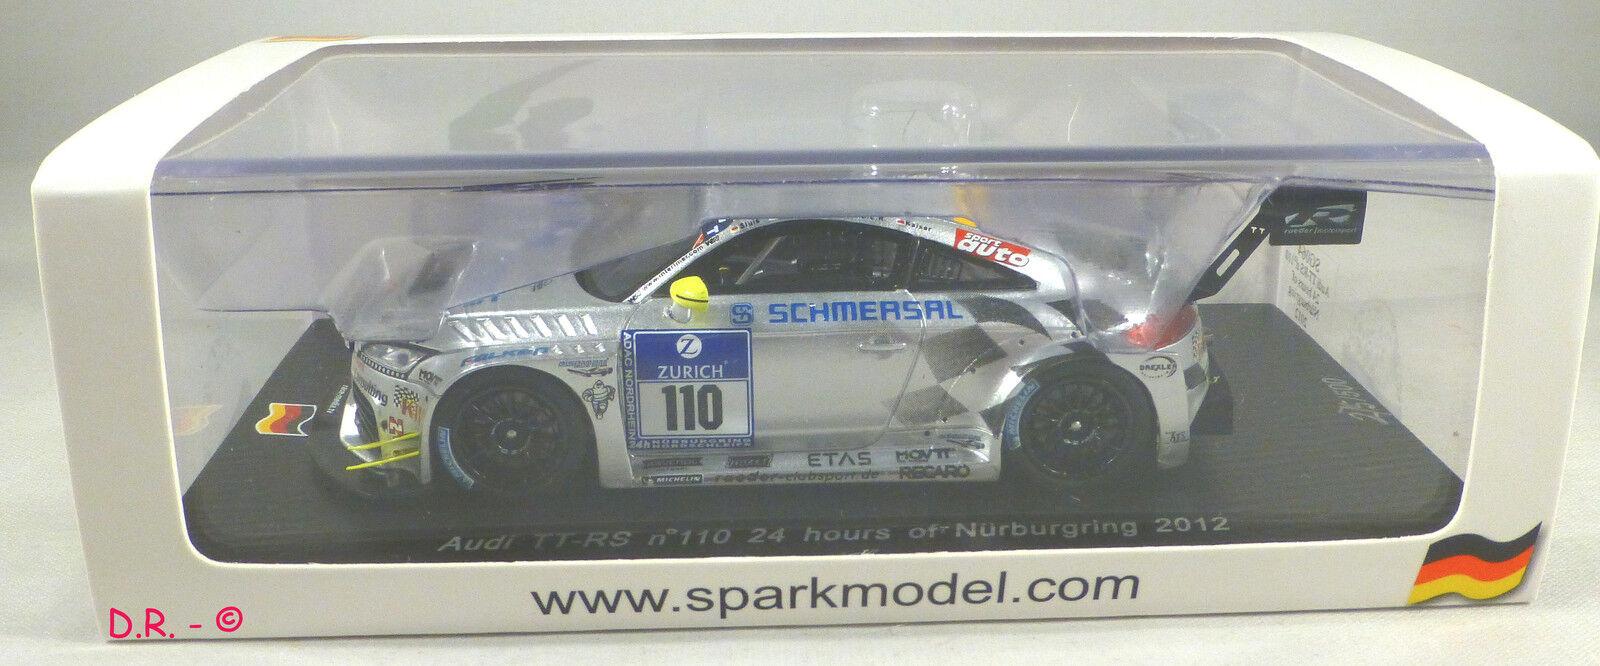 AUDI TT RS  110 Kaiser-Sluis TEAM RAEDER 24H NURBURGRING 2012 pcs 500 SPARK 1 43